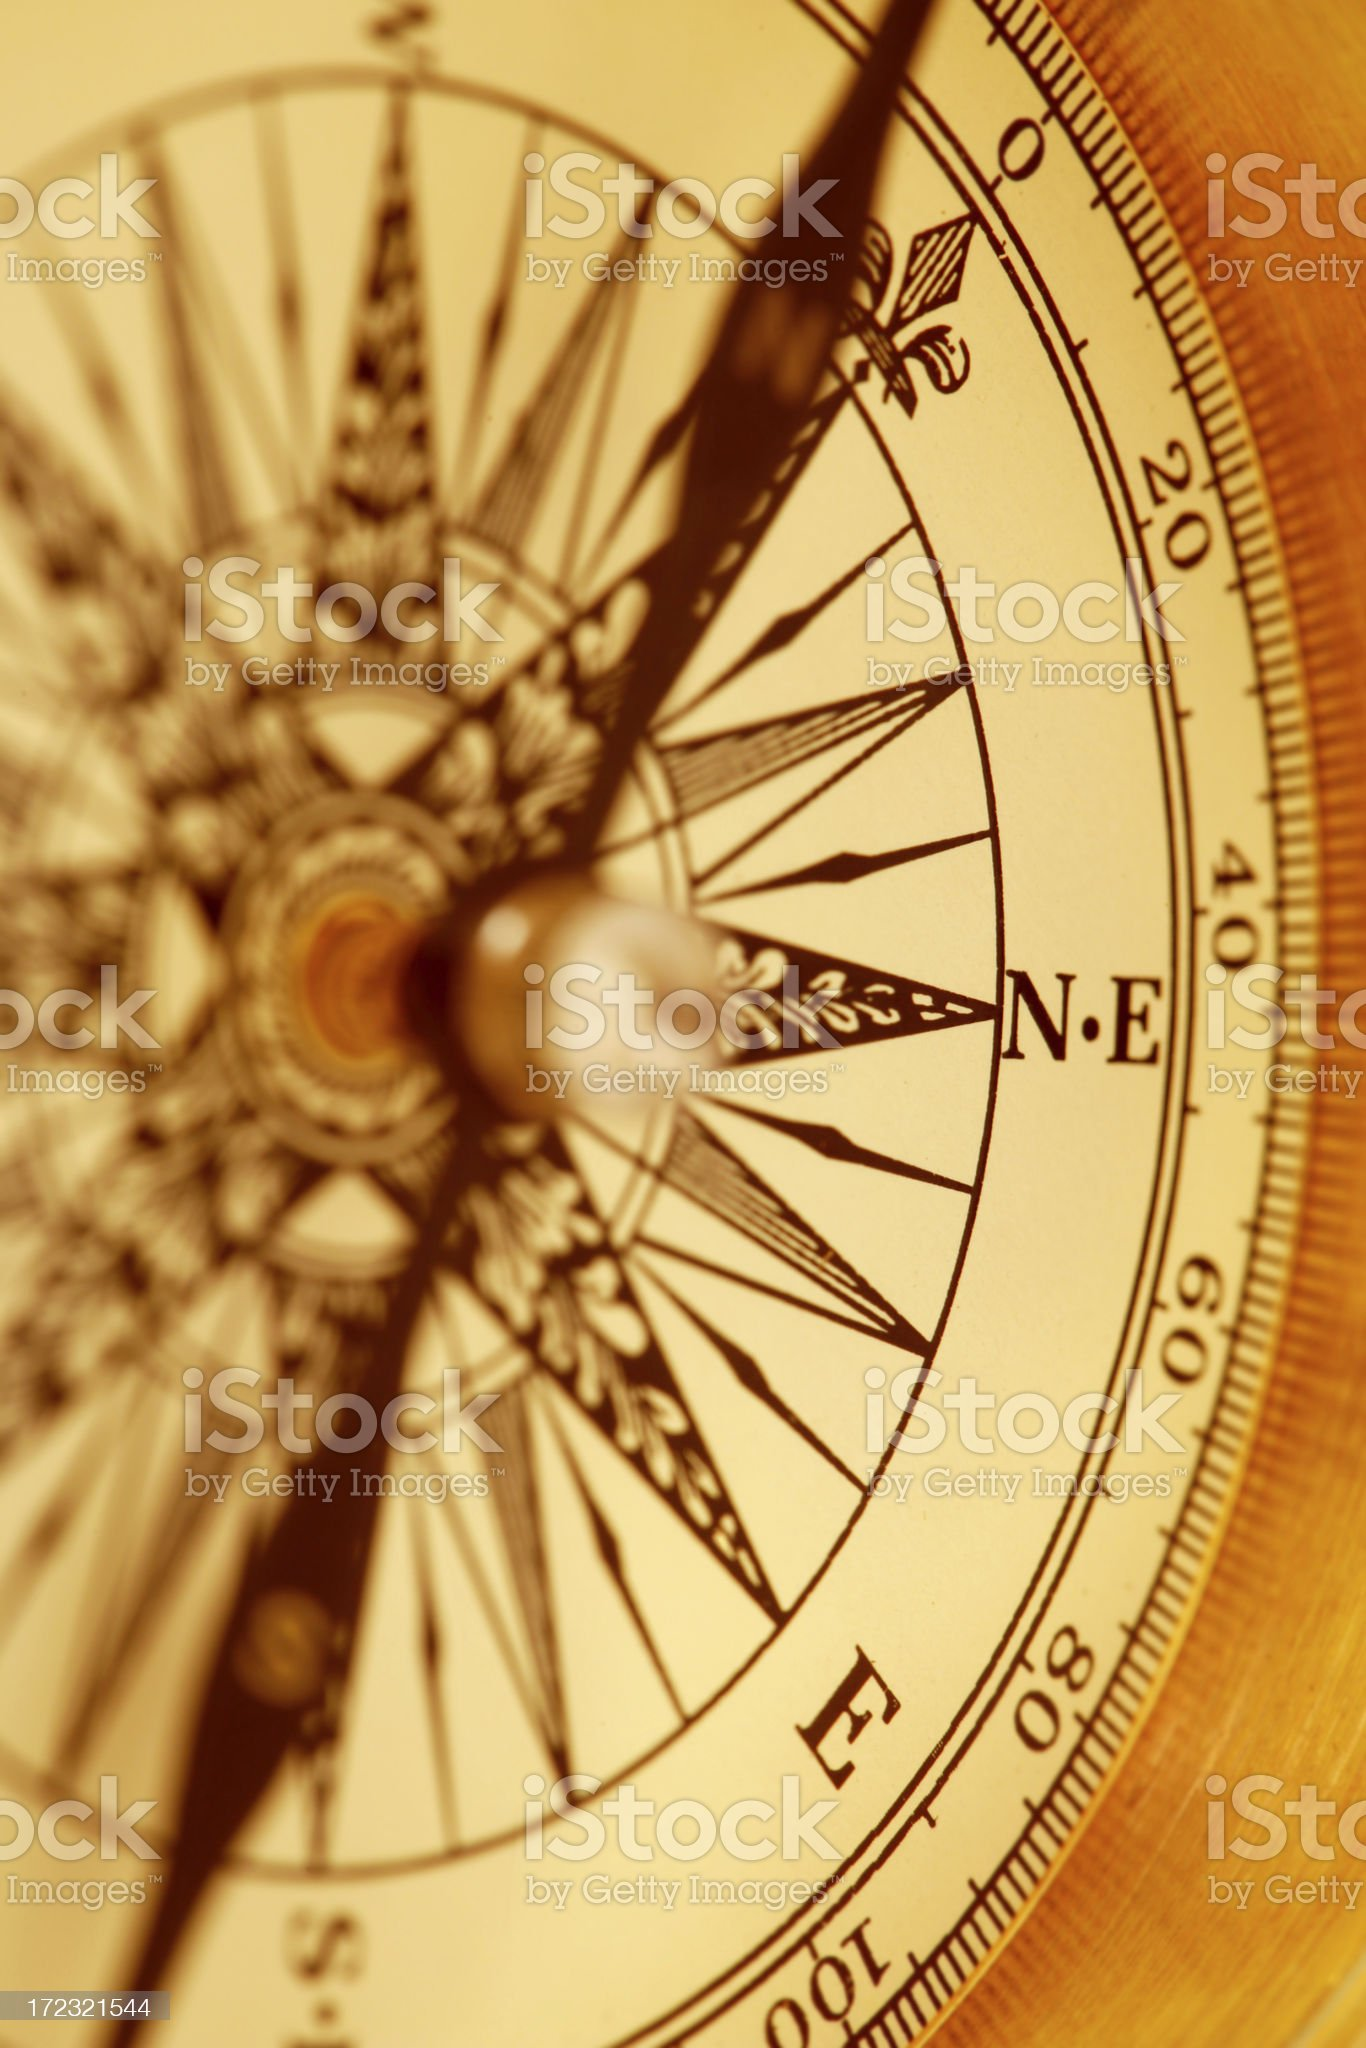 Compass Closeup royalty-free stock photo